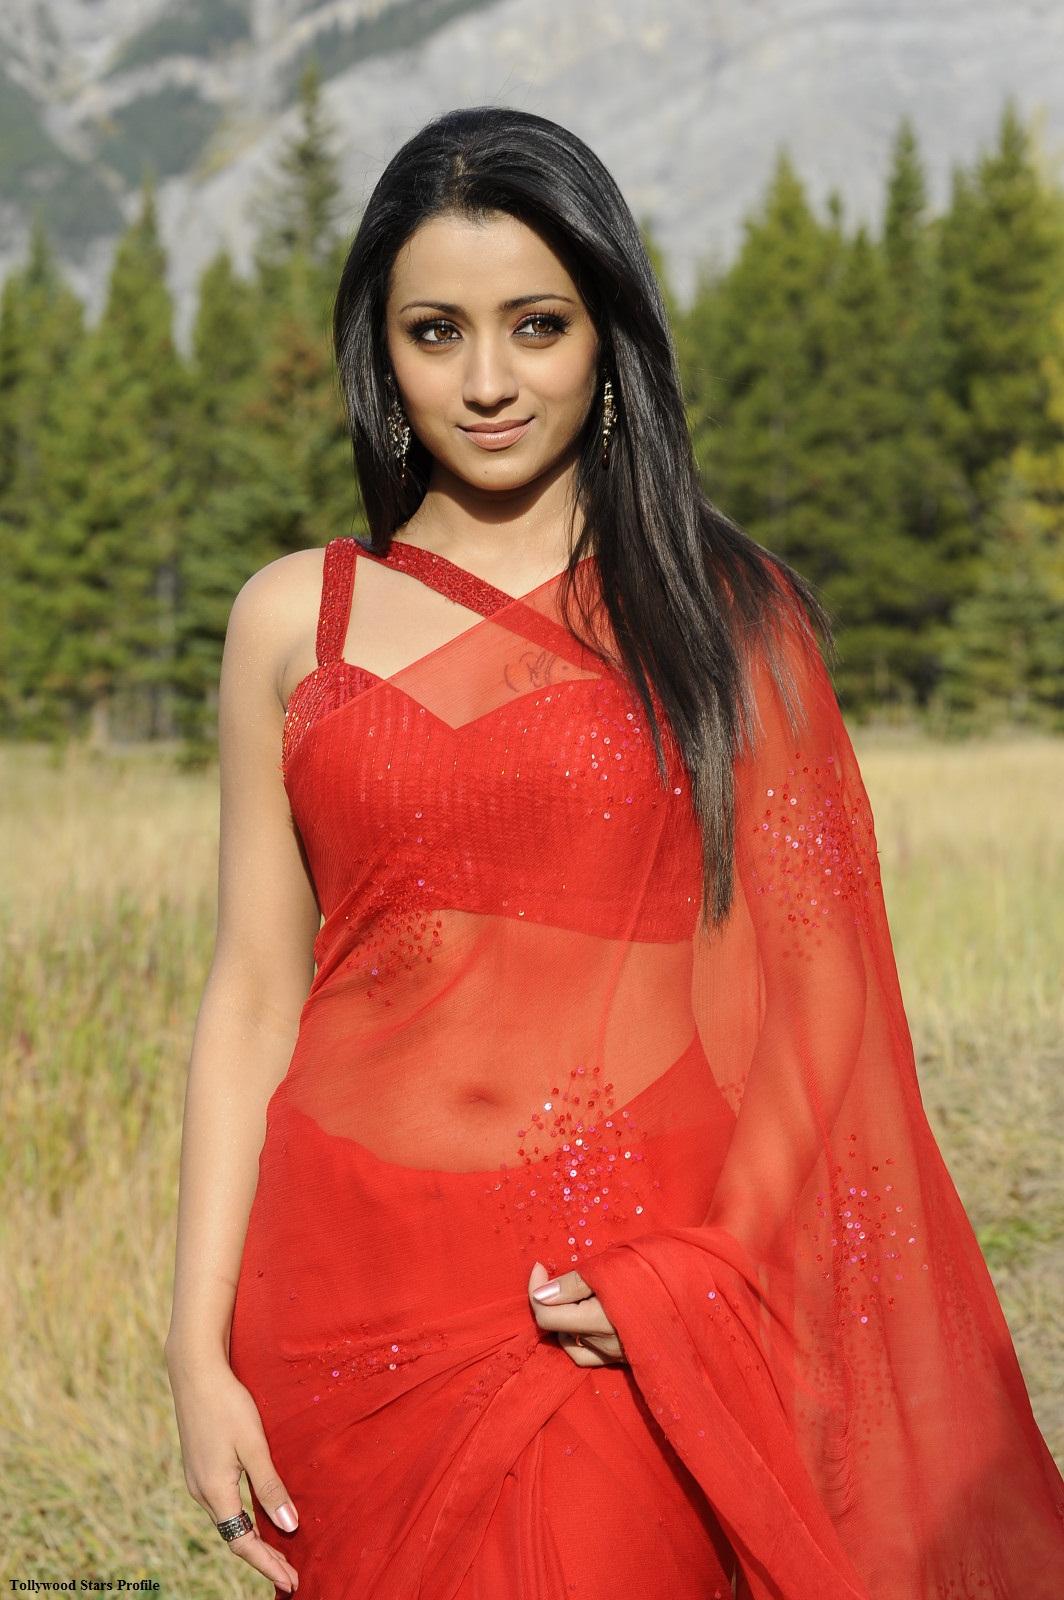 Preity Zinta Fake | Nude Bollywood & Bollywood Actress